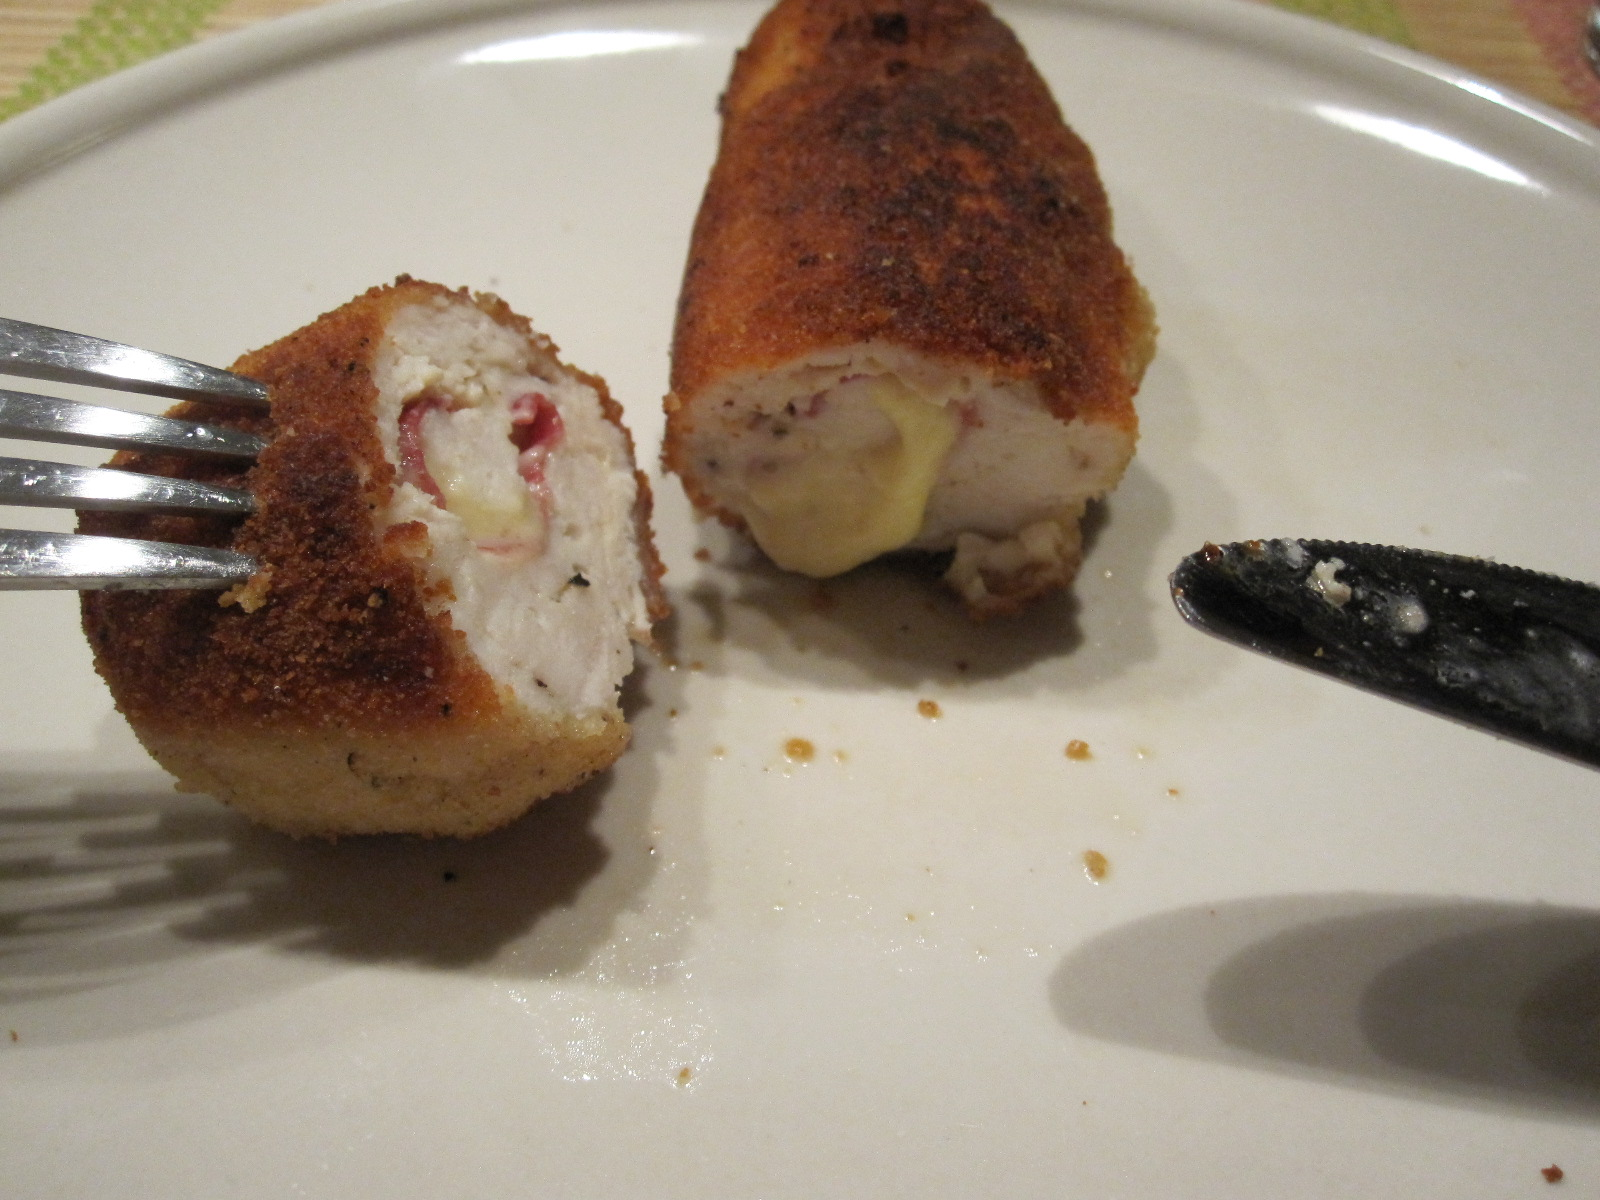 Jambonlu tavuk tarifi